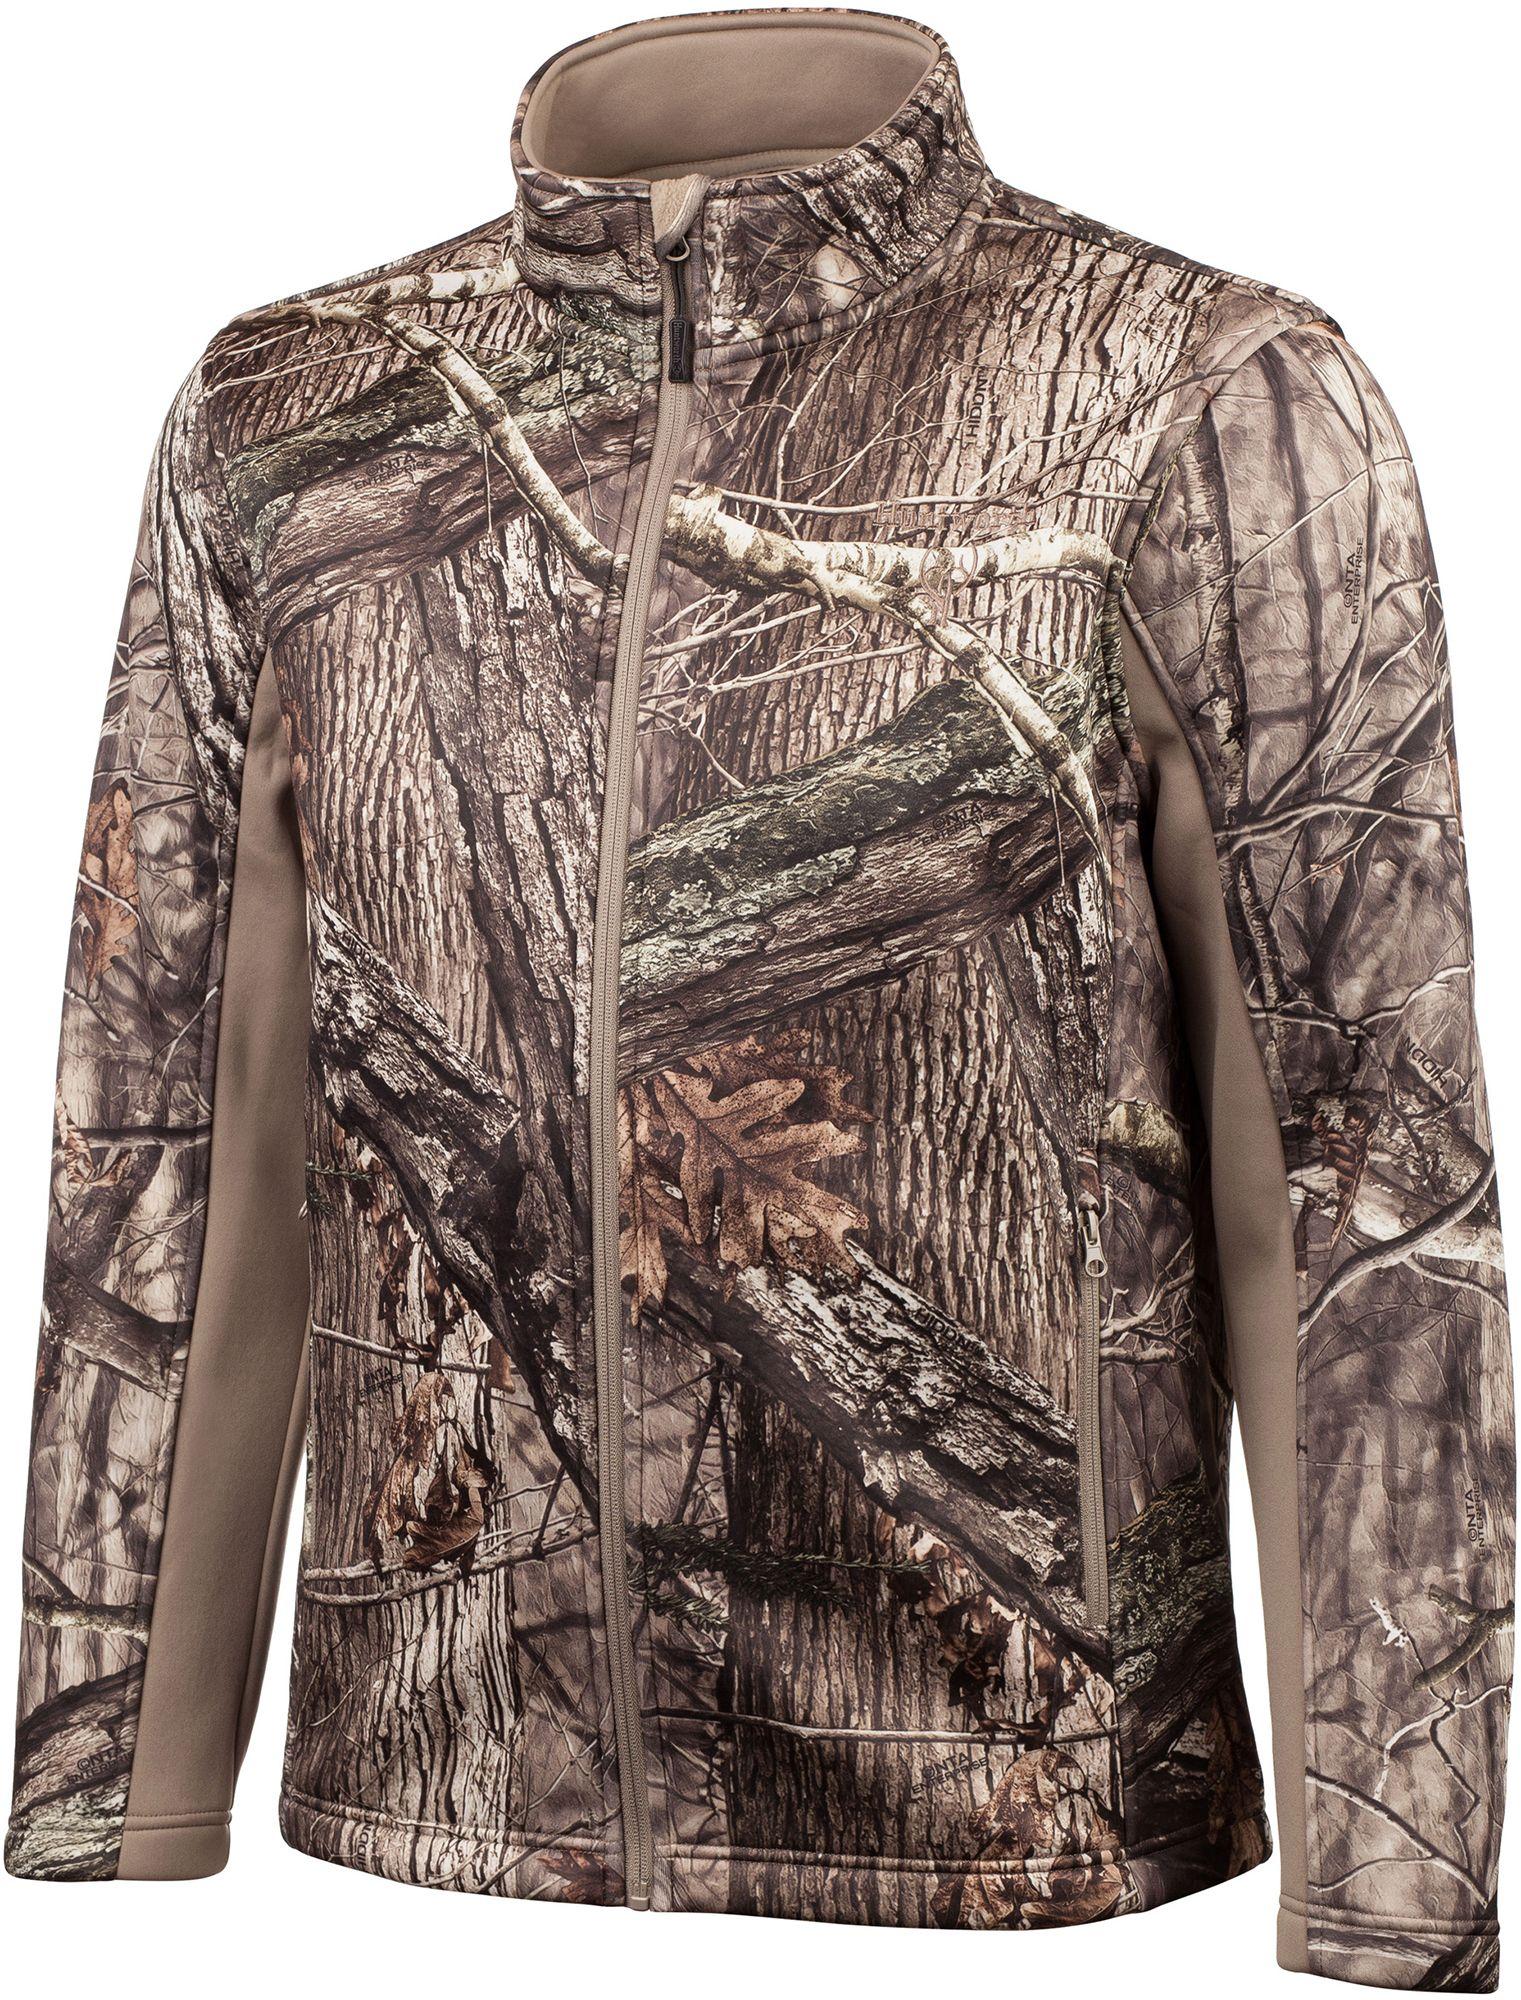 Huntworth Men's Mid Weight Soft Shell Hunting Jacket, Size: Medium, Hidd N Camo